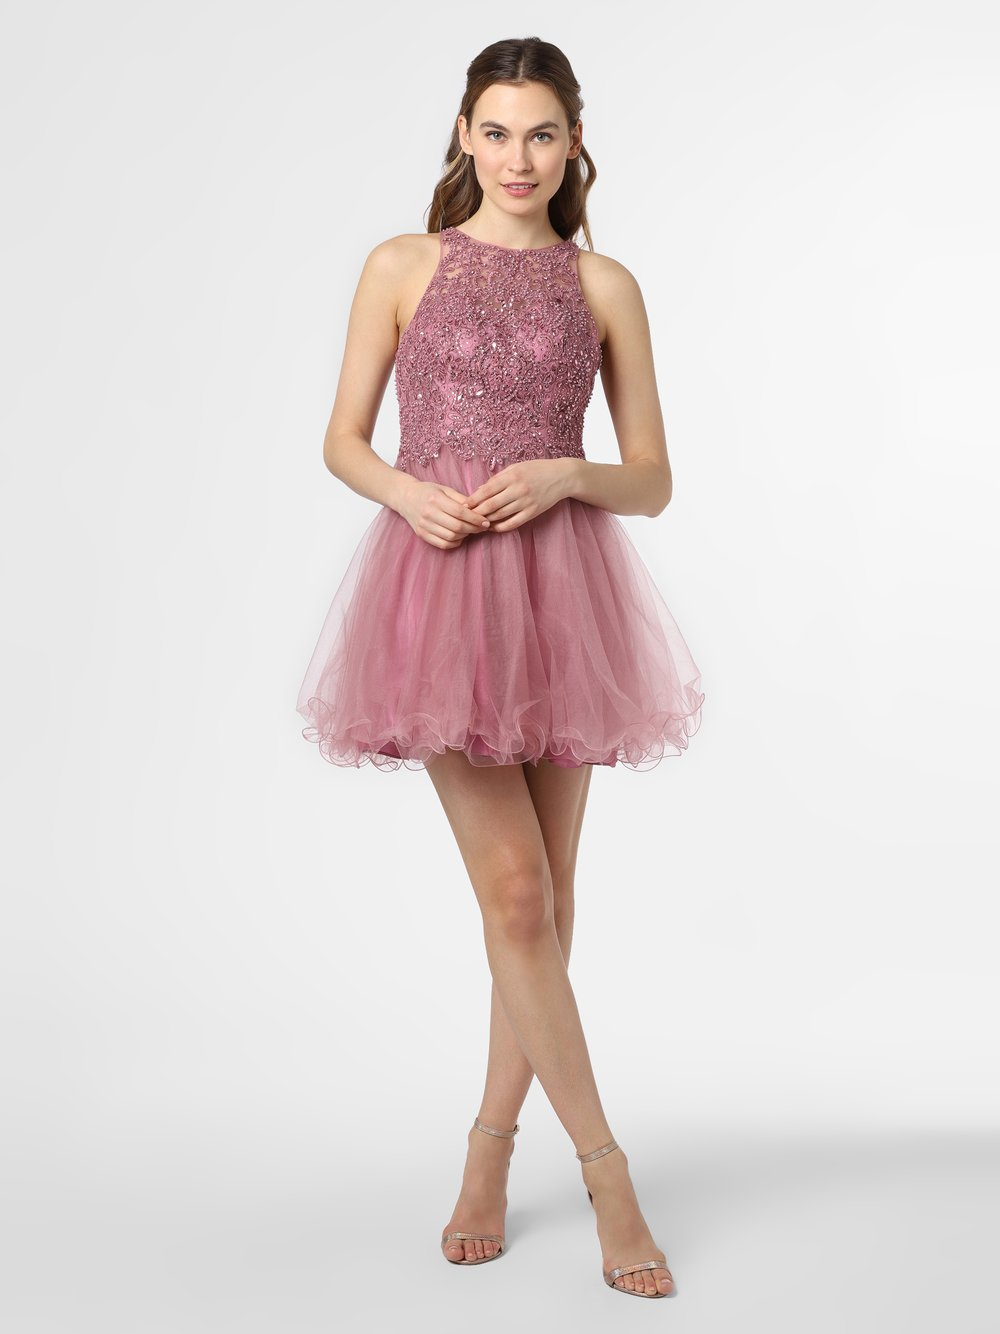 Laona – Damska sukienka wieczorowa, różowy Van Graaf 472451-0001-00380